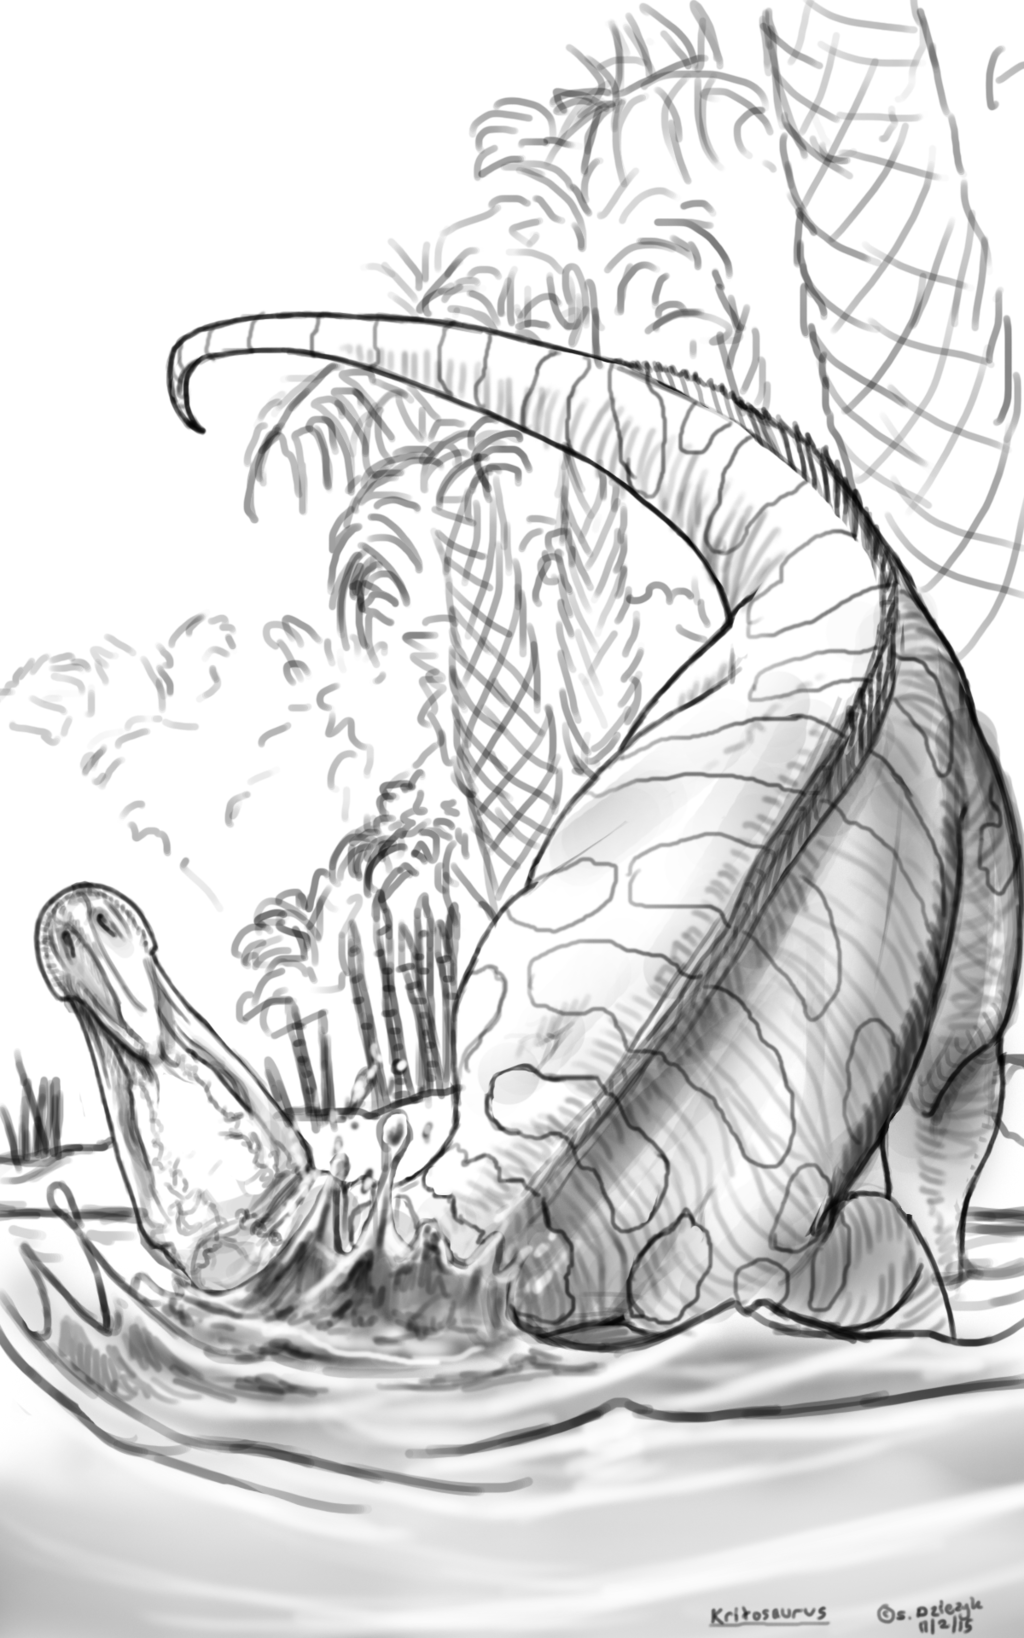 Dinovember - 2 - Kritosaurus bathing